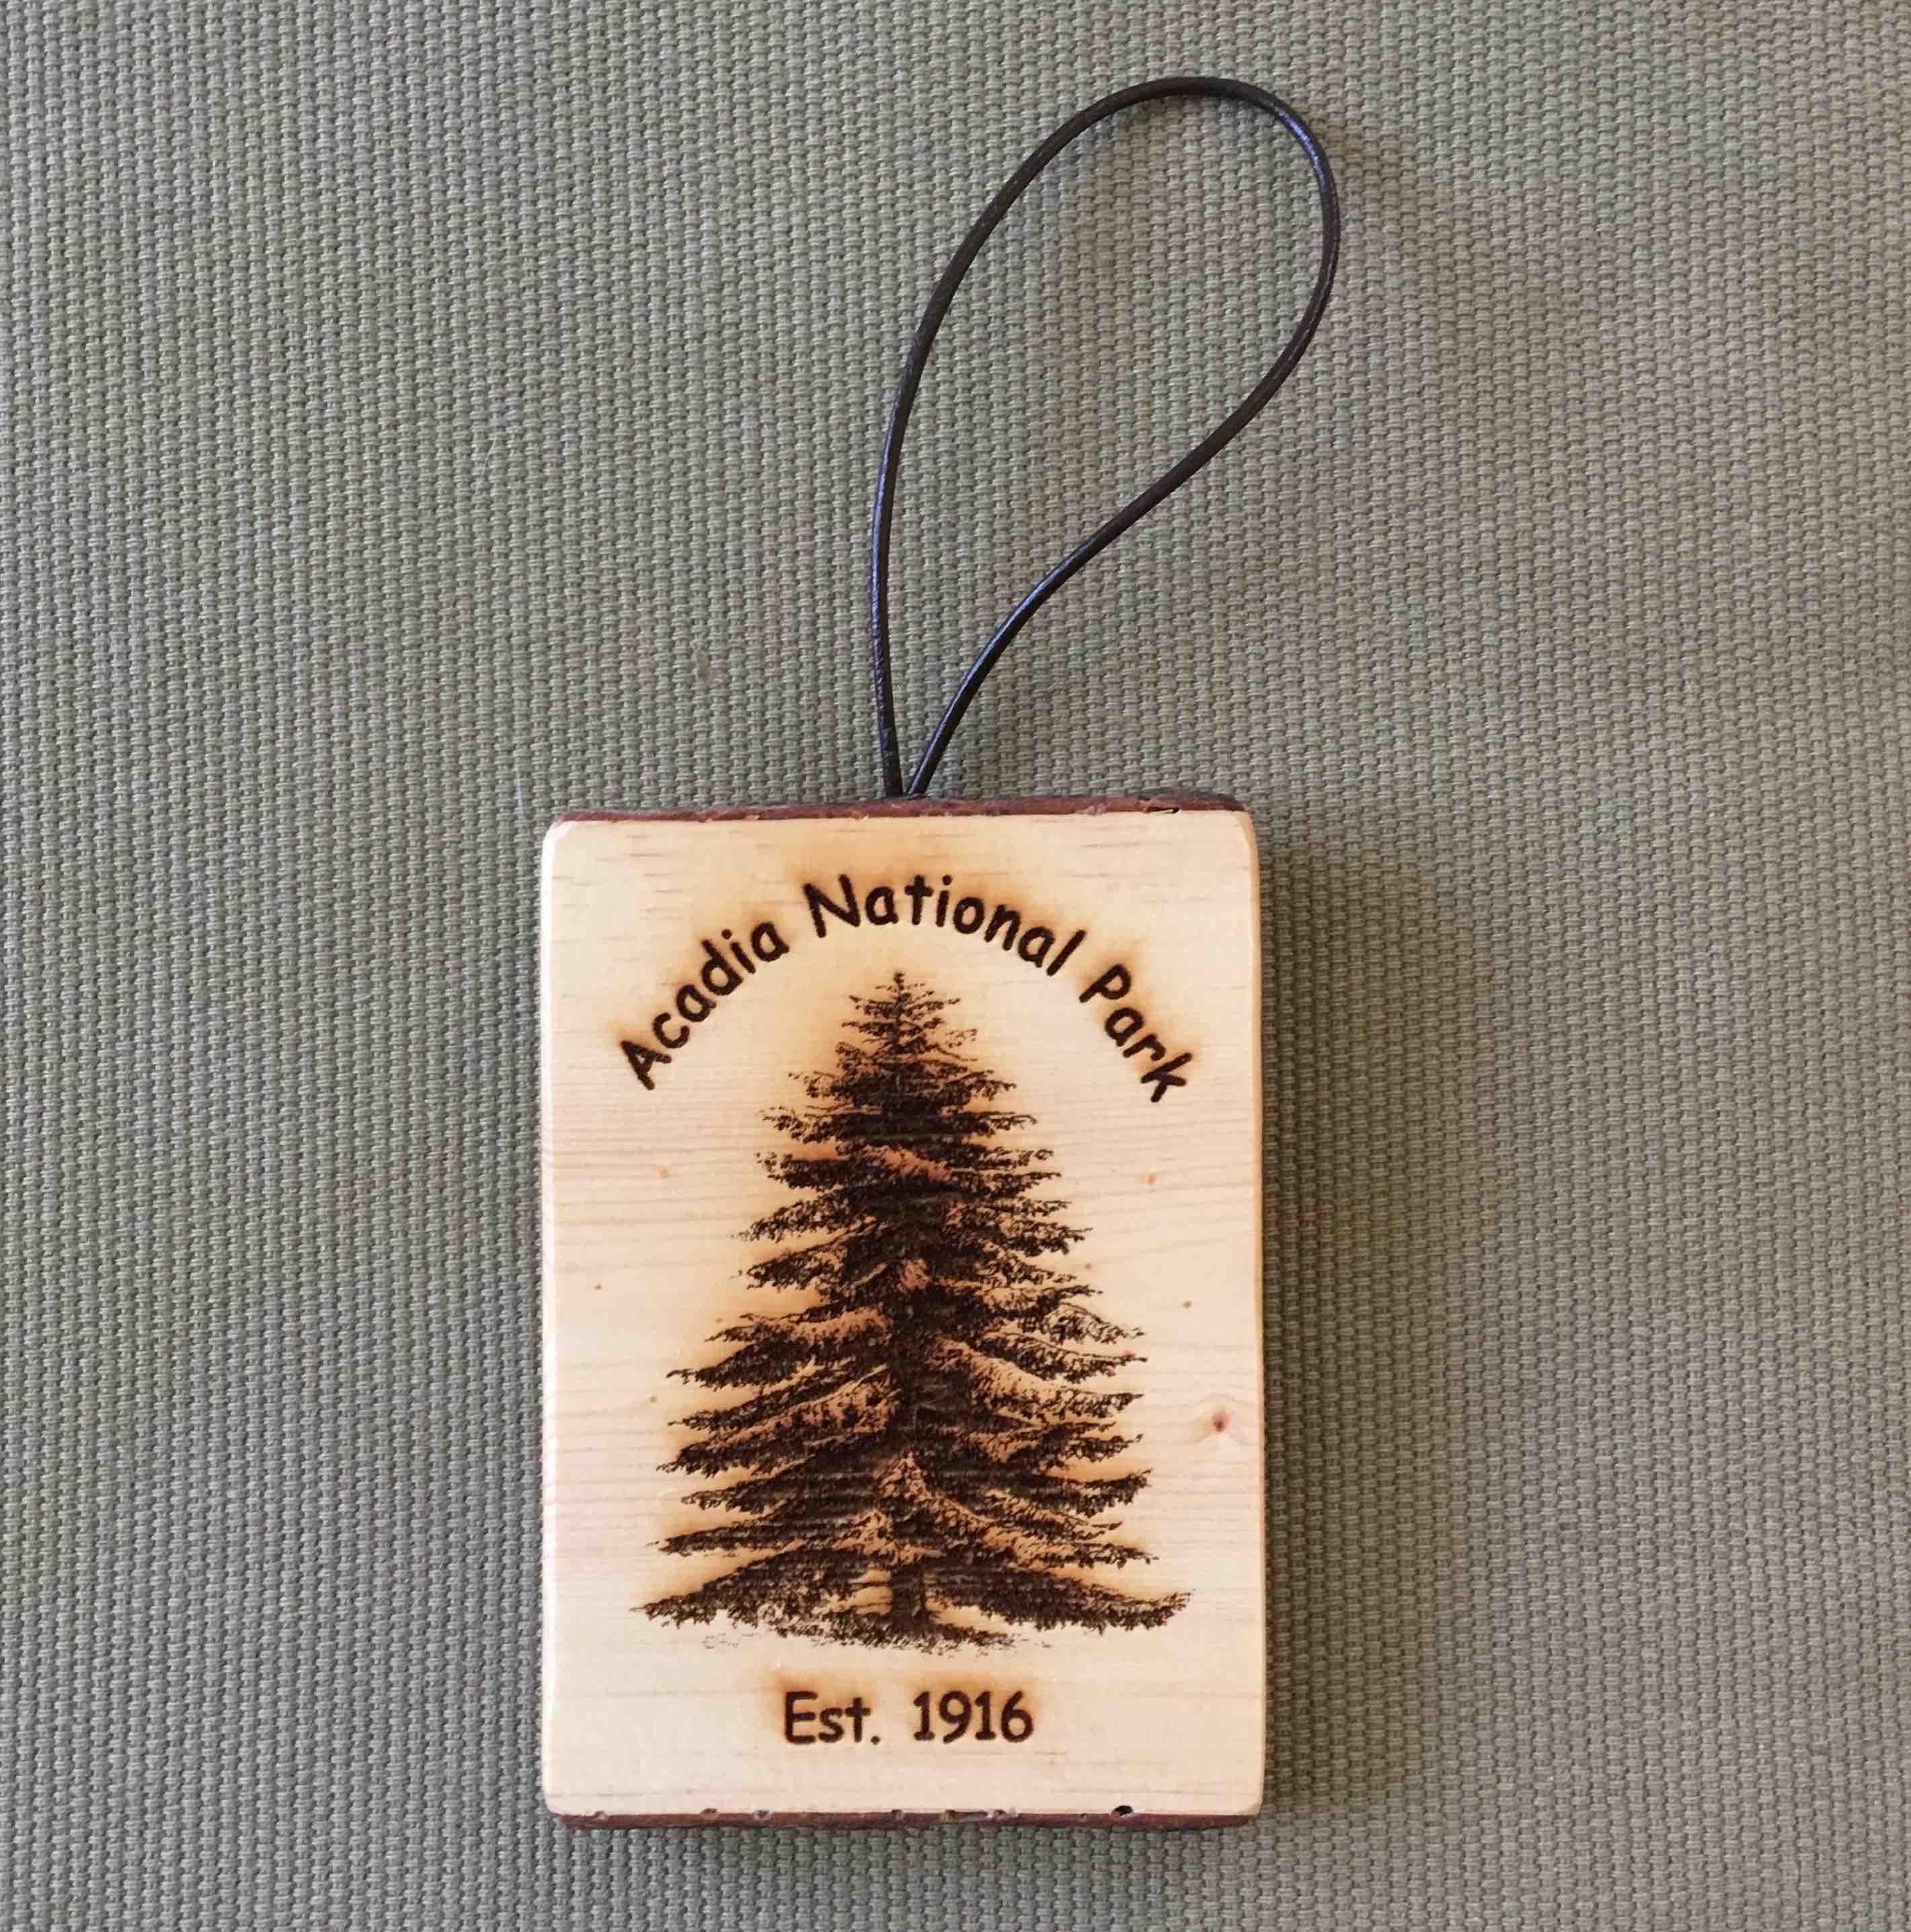 Acadia National Park – Bark Ornaments